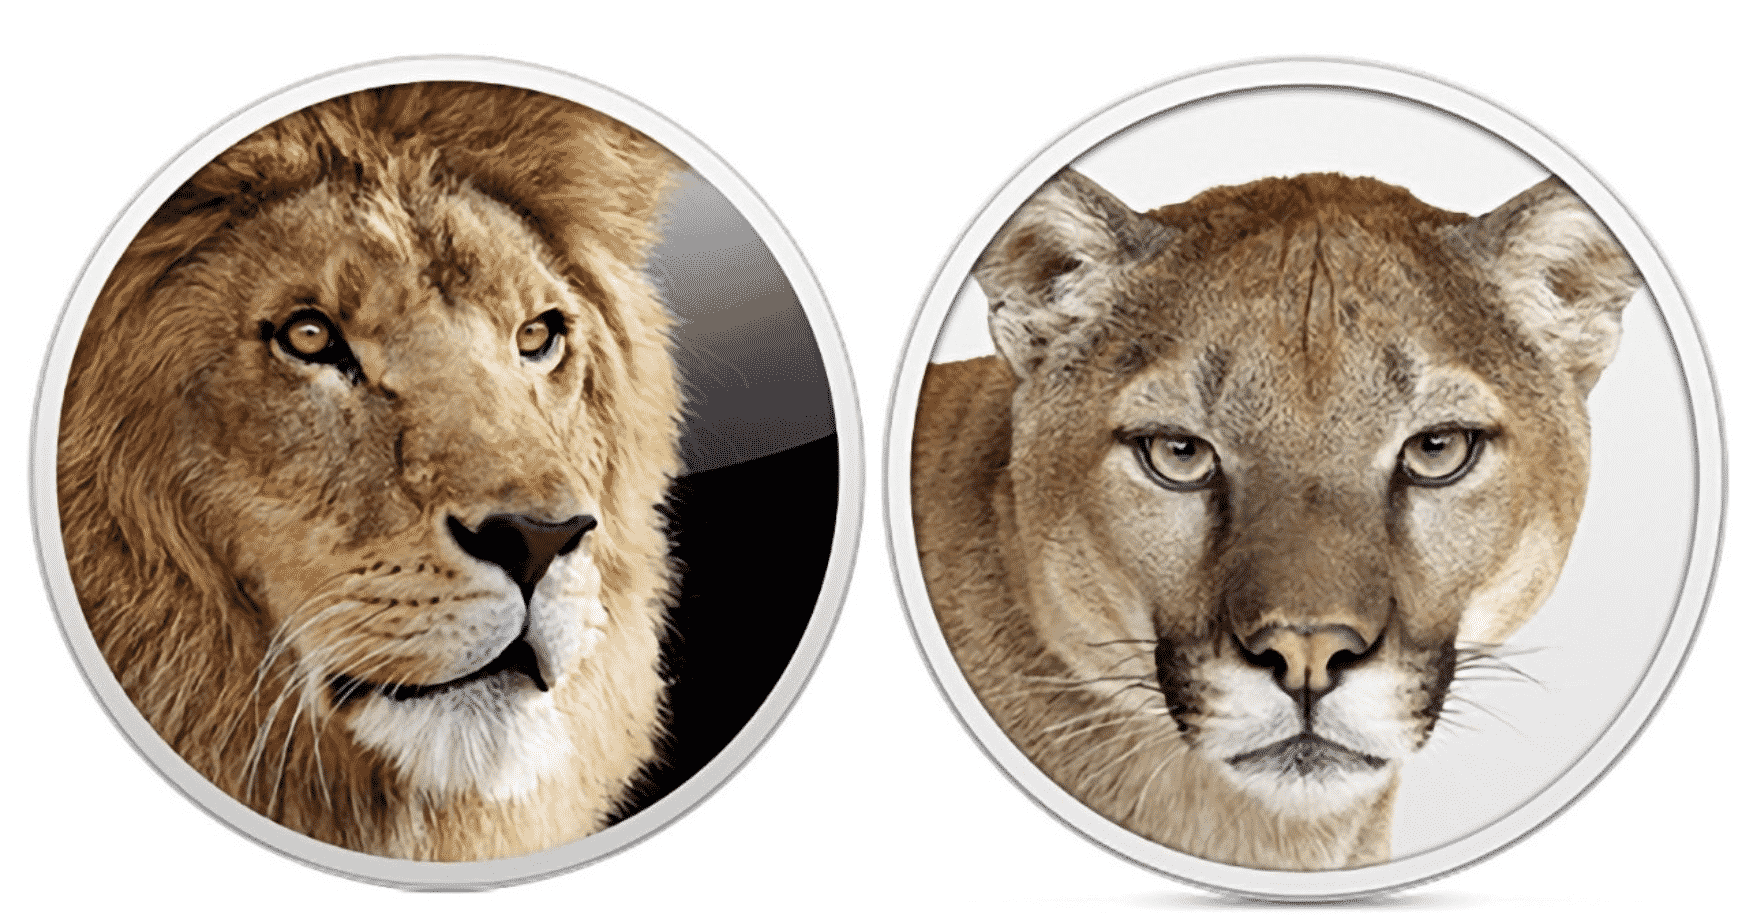 Mac OS X Mountain Lion and Lion